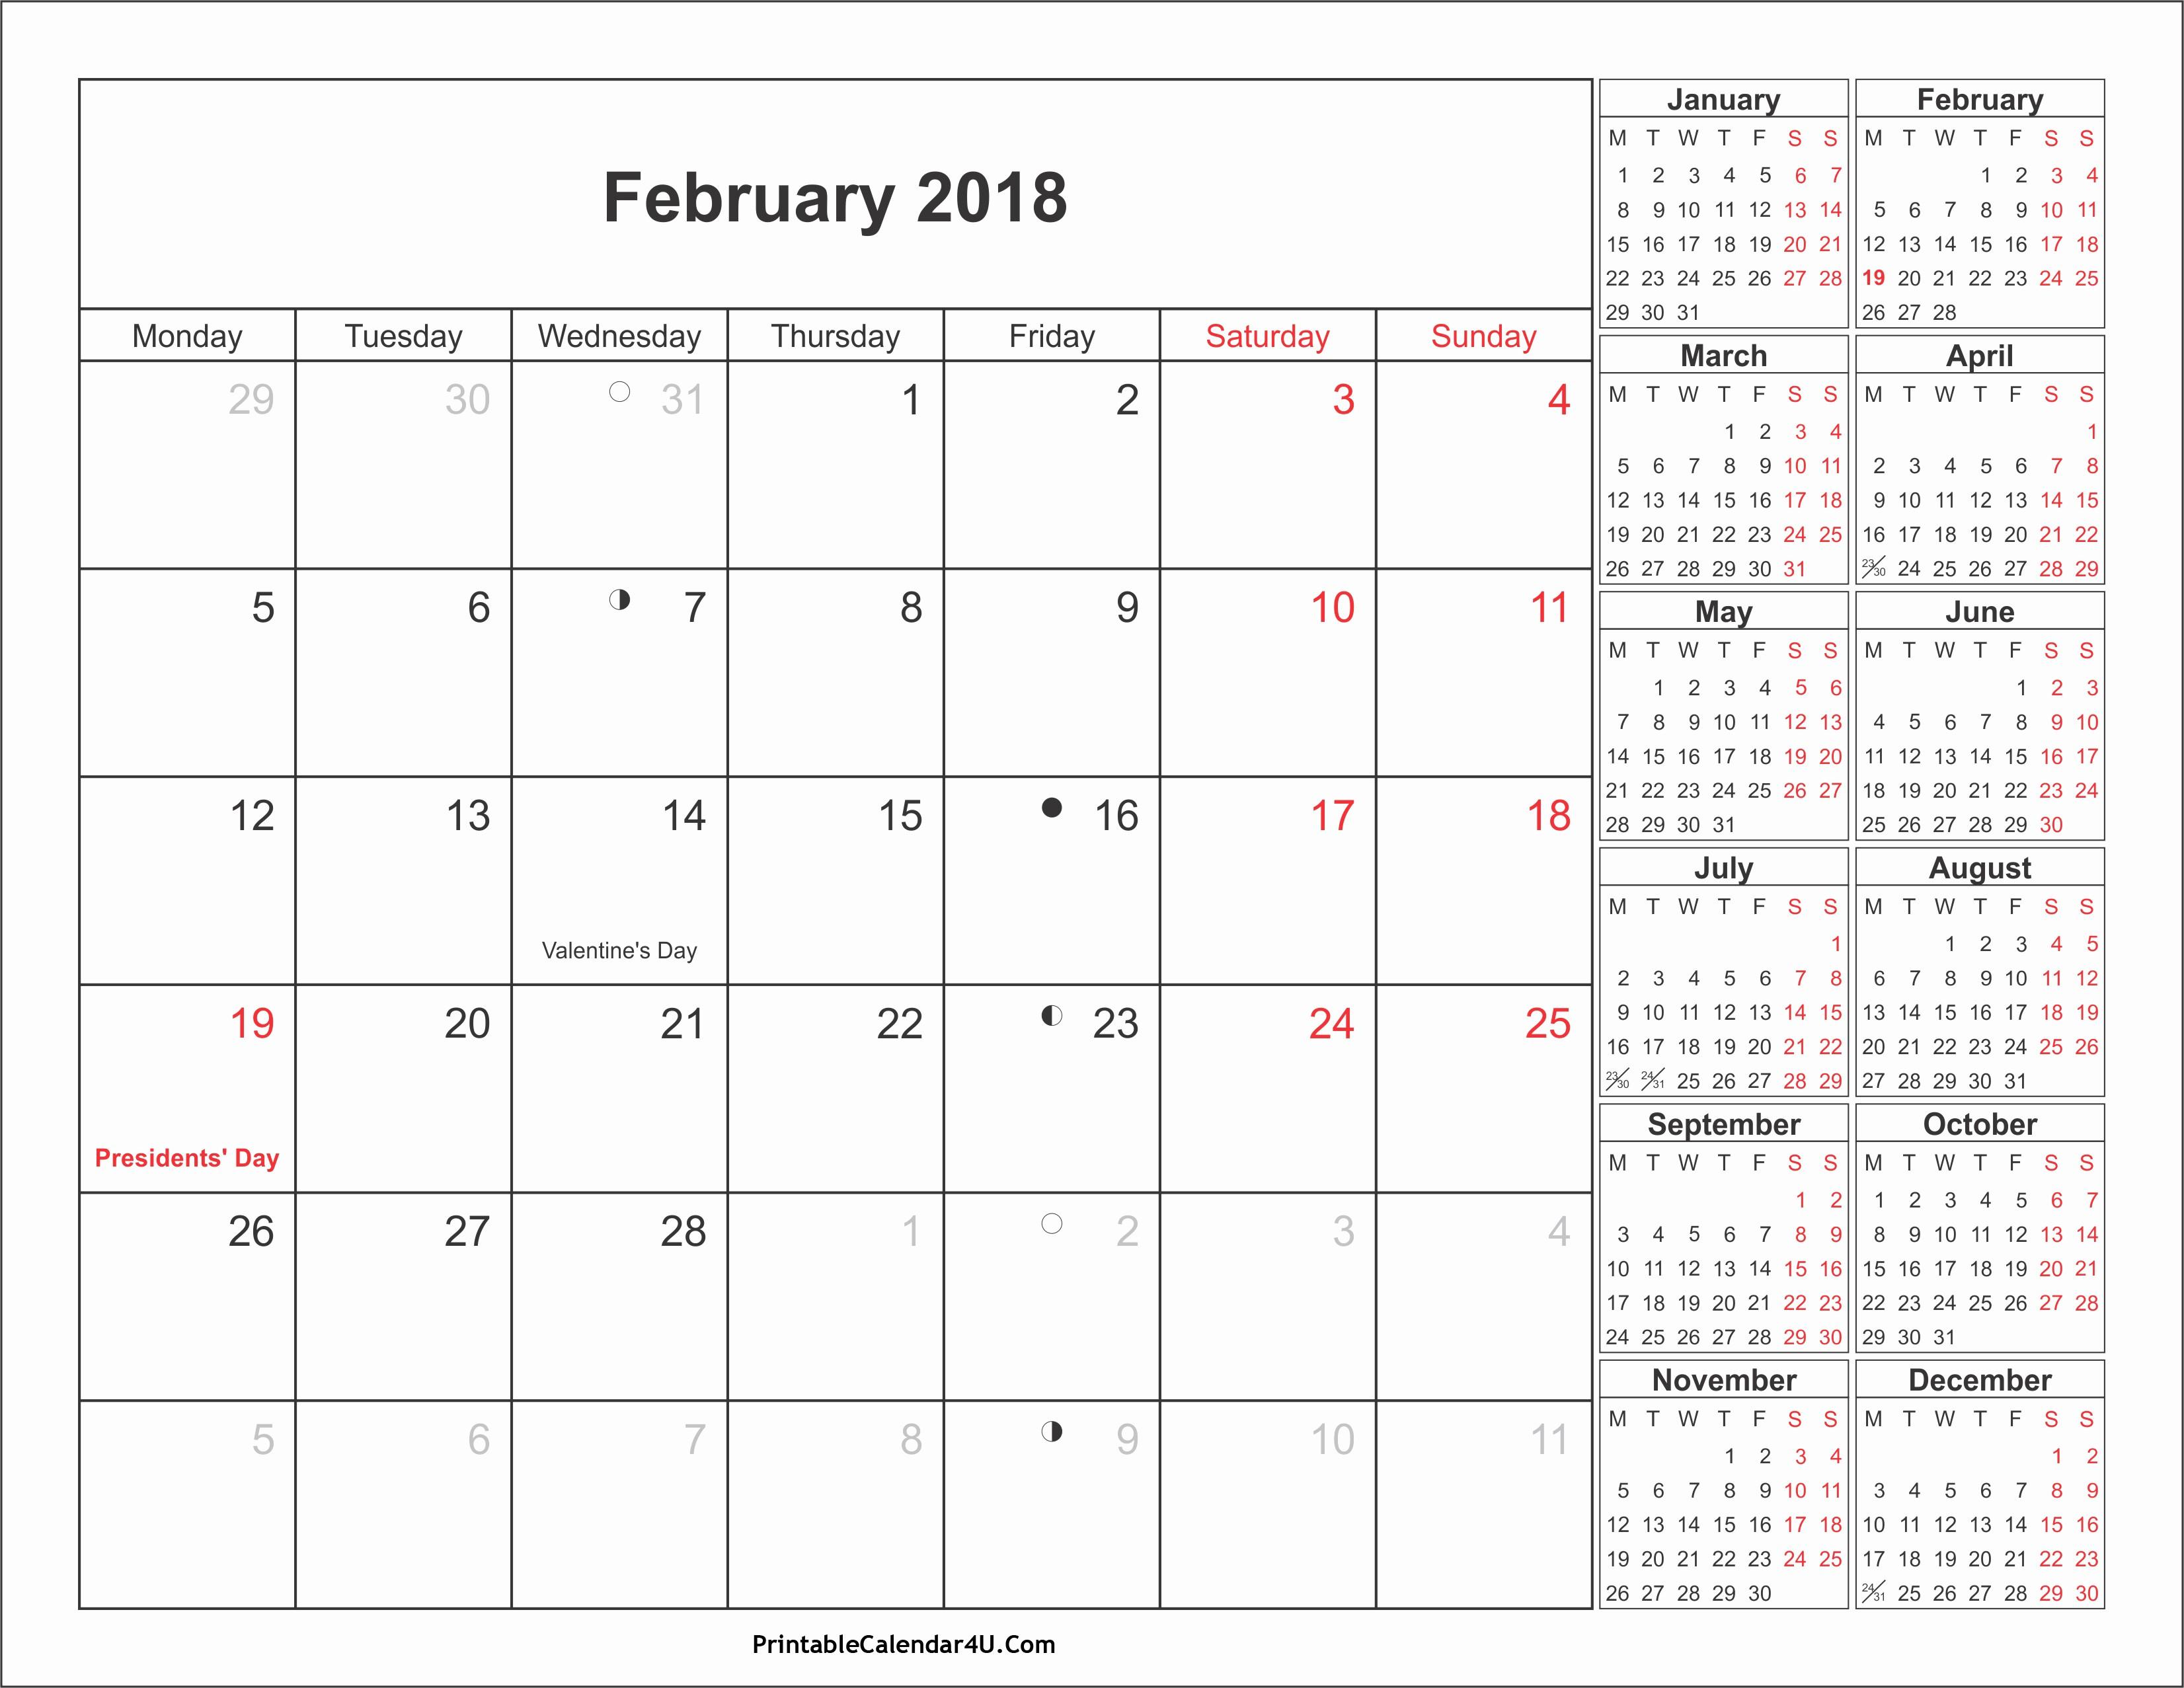 2017-2018 Printable Calendar Awesome February 2018 Calendar with Holidays